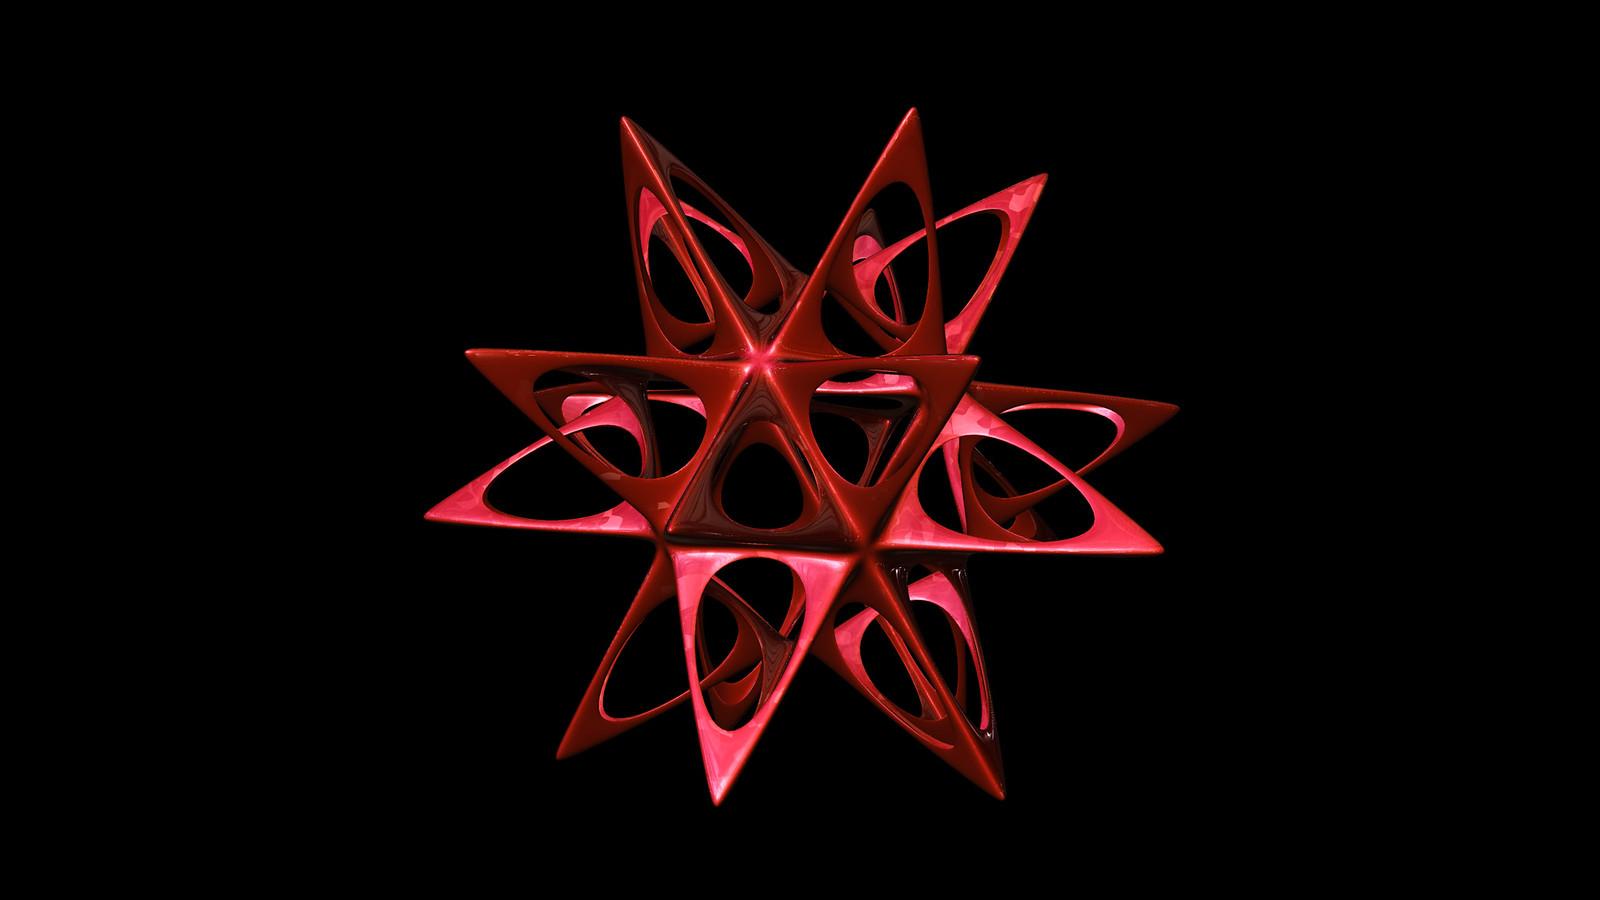 Spiky icosahedron